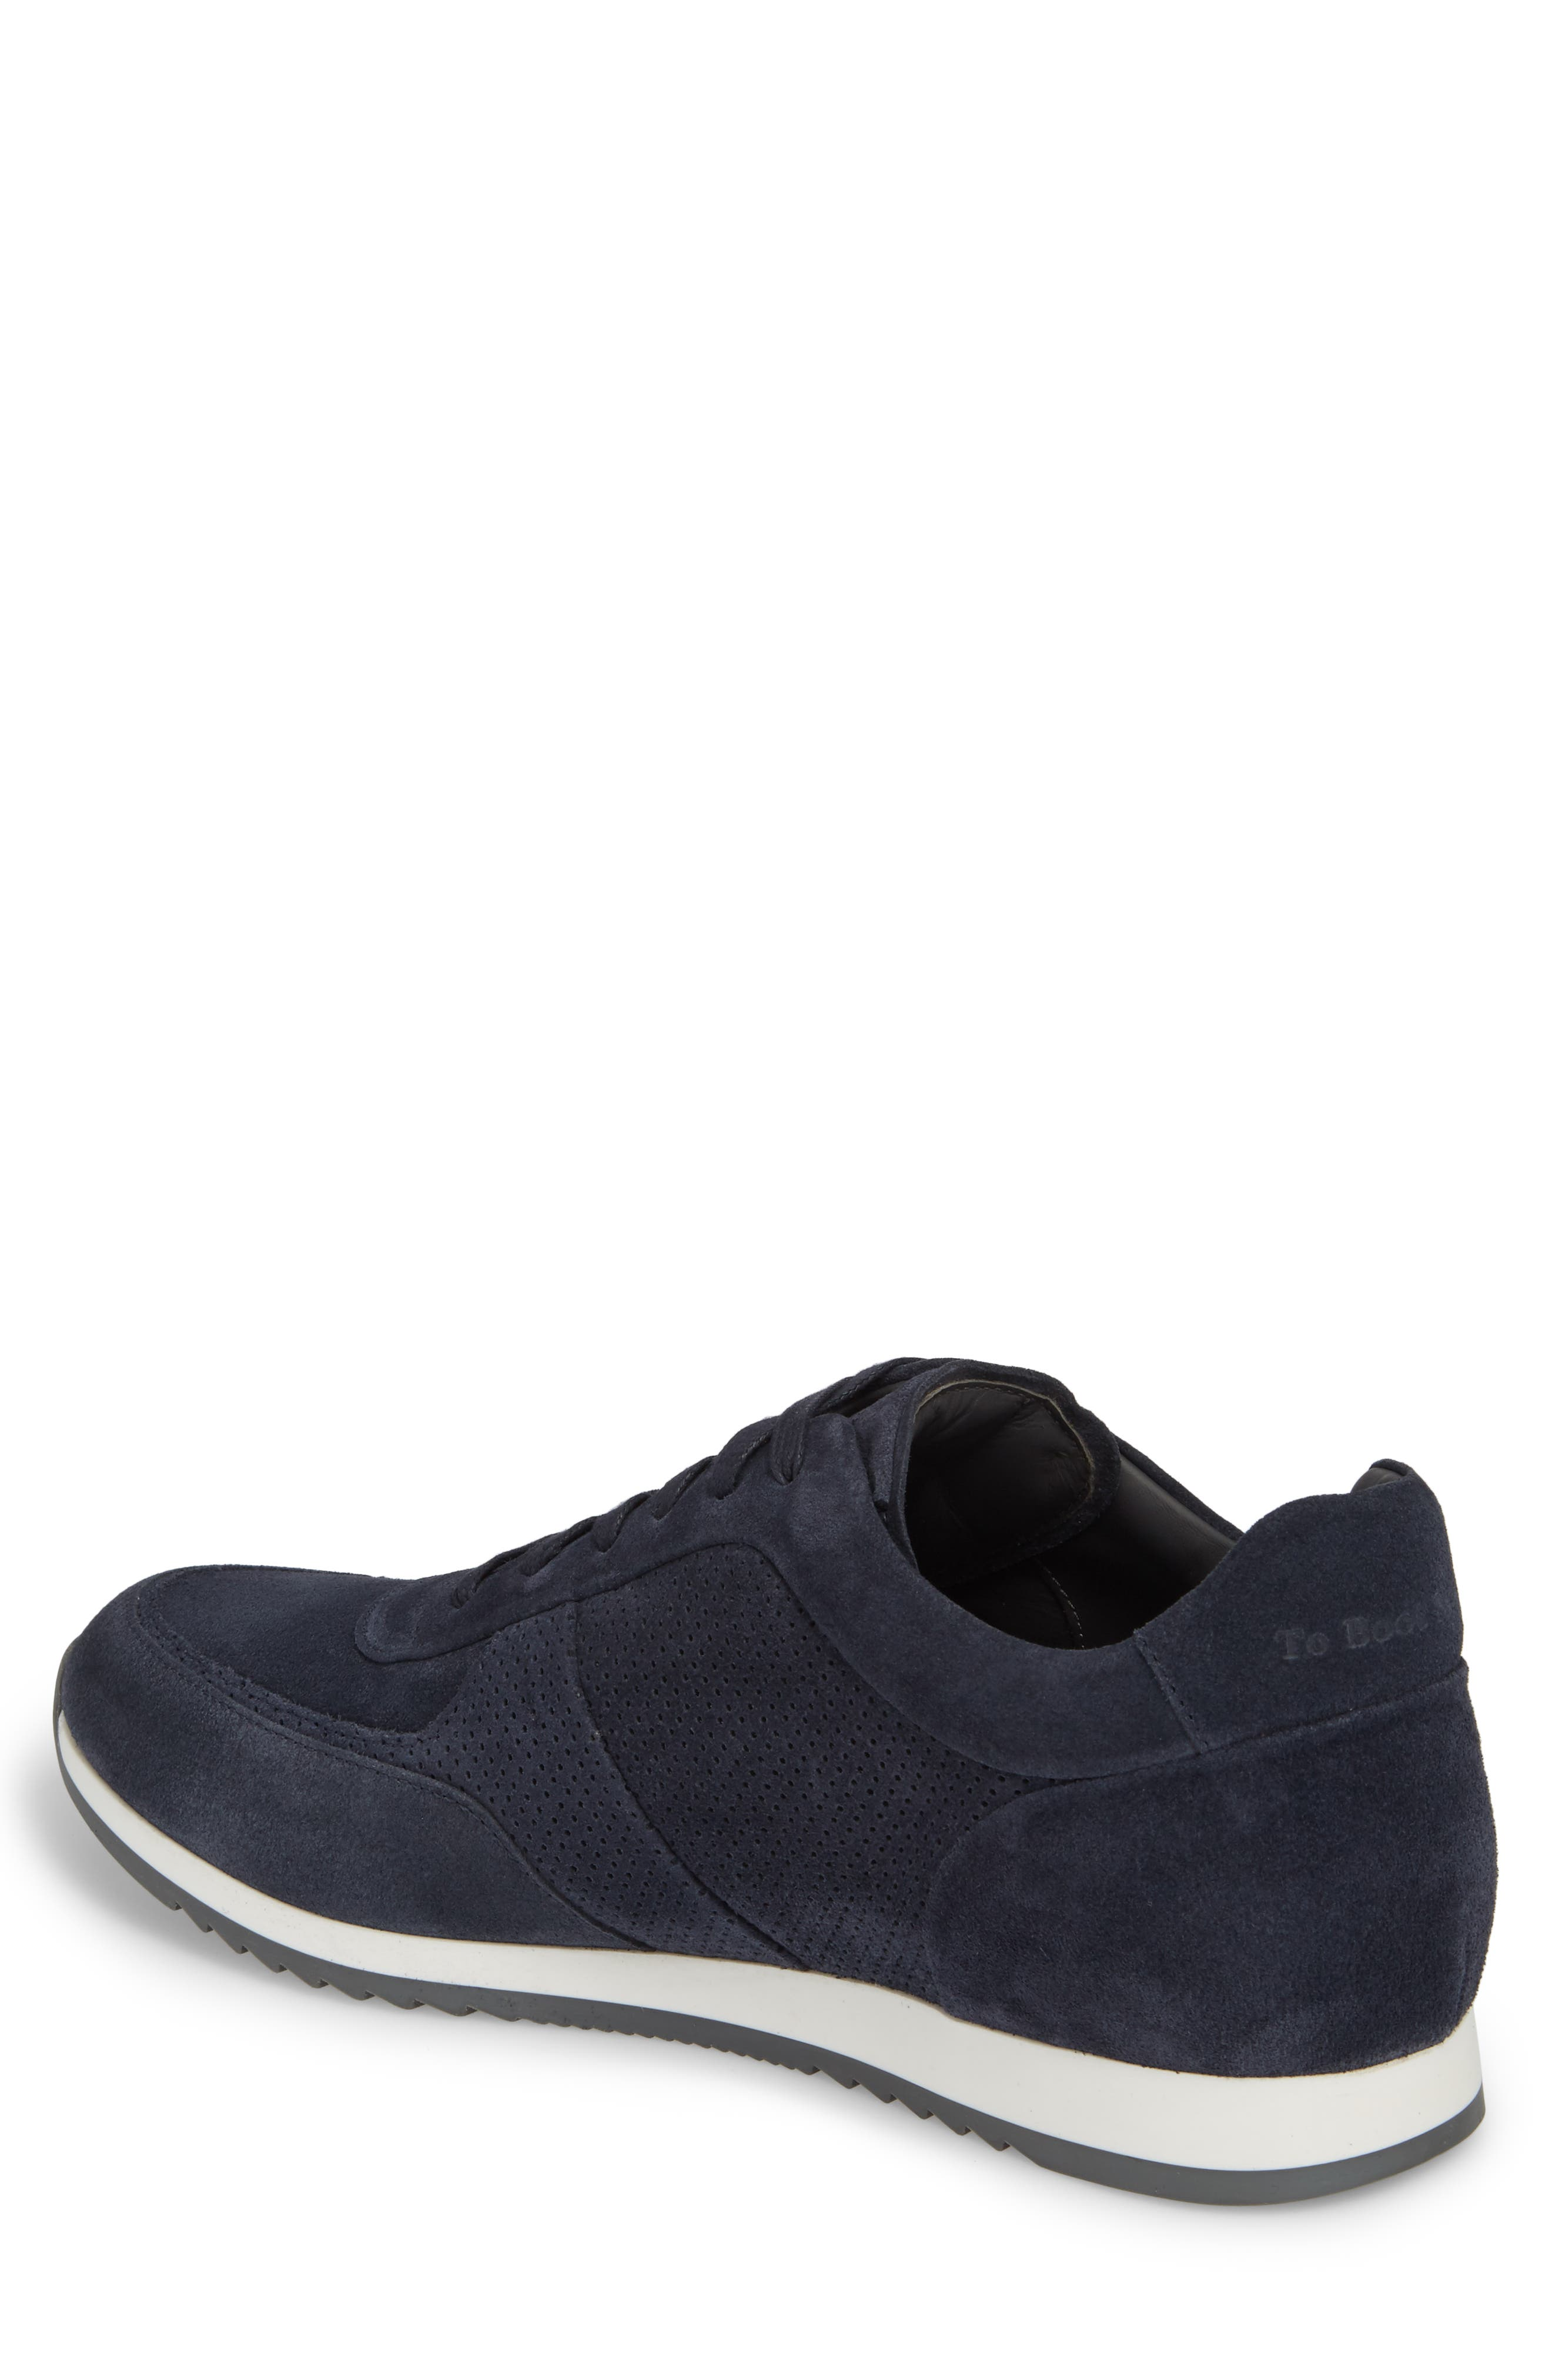 Alternate Image 2  - To Boot New York Fordham Low Top Sneaker (Men)